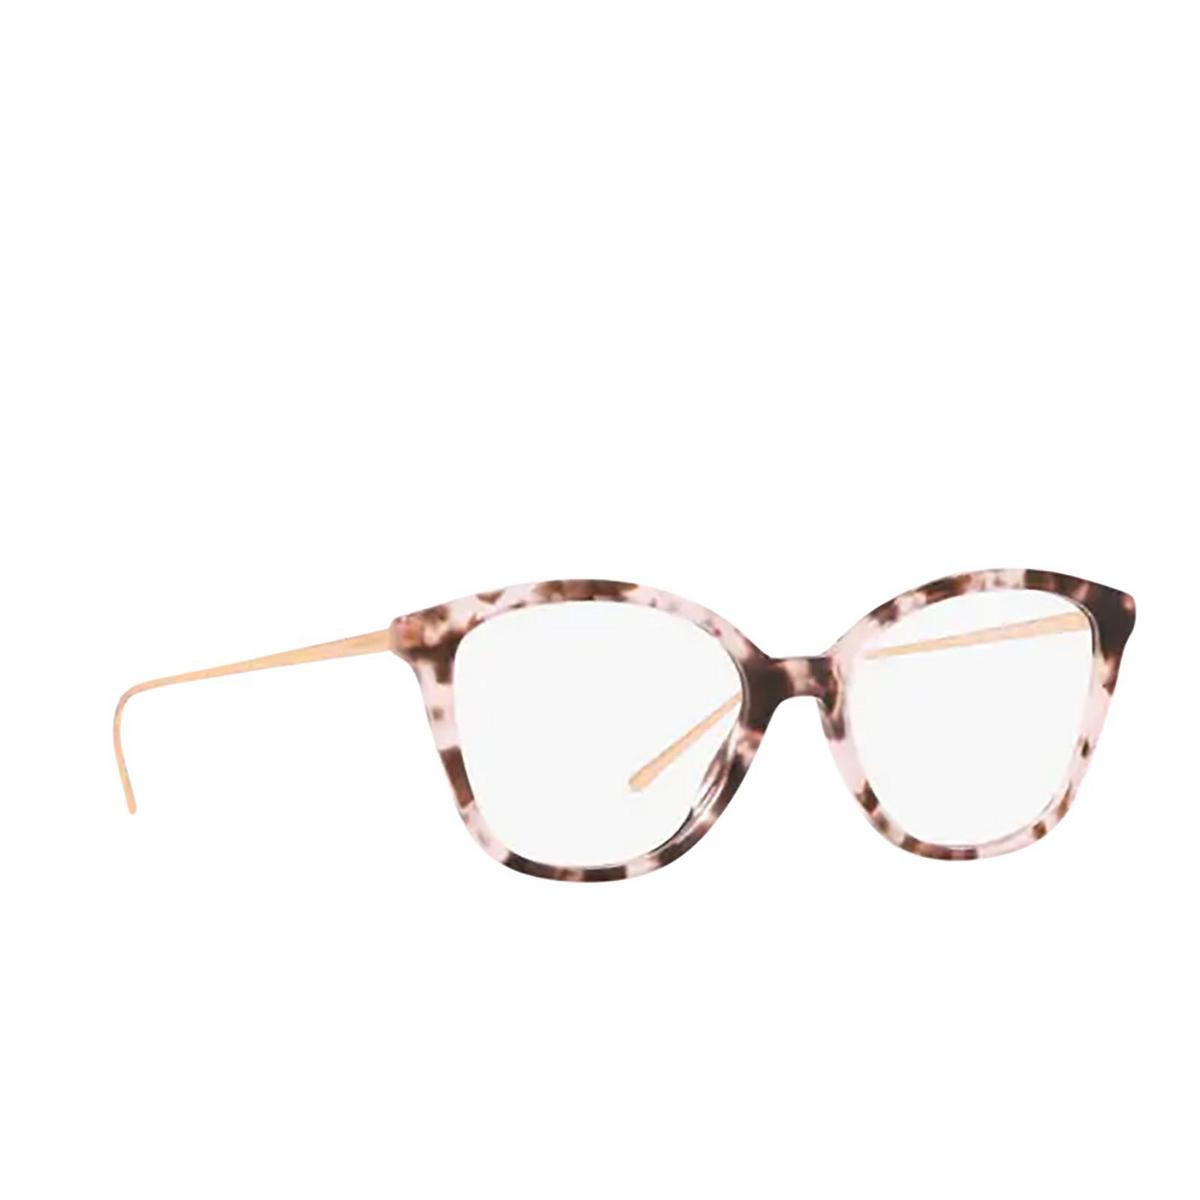 Prada® Square Eyeglasses: PR 11VV color Pink Havana ROJ1O1 - three-quarters view.